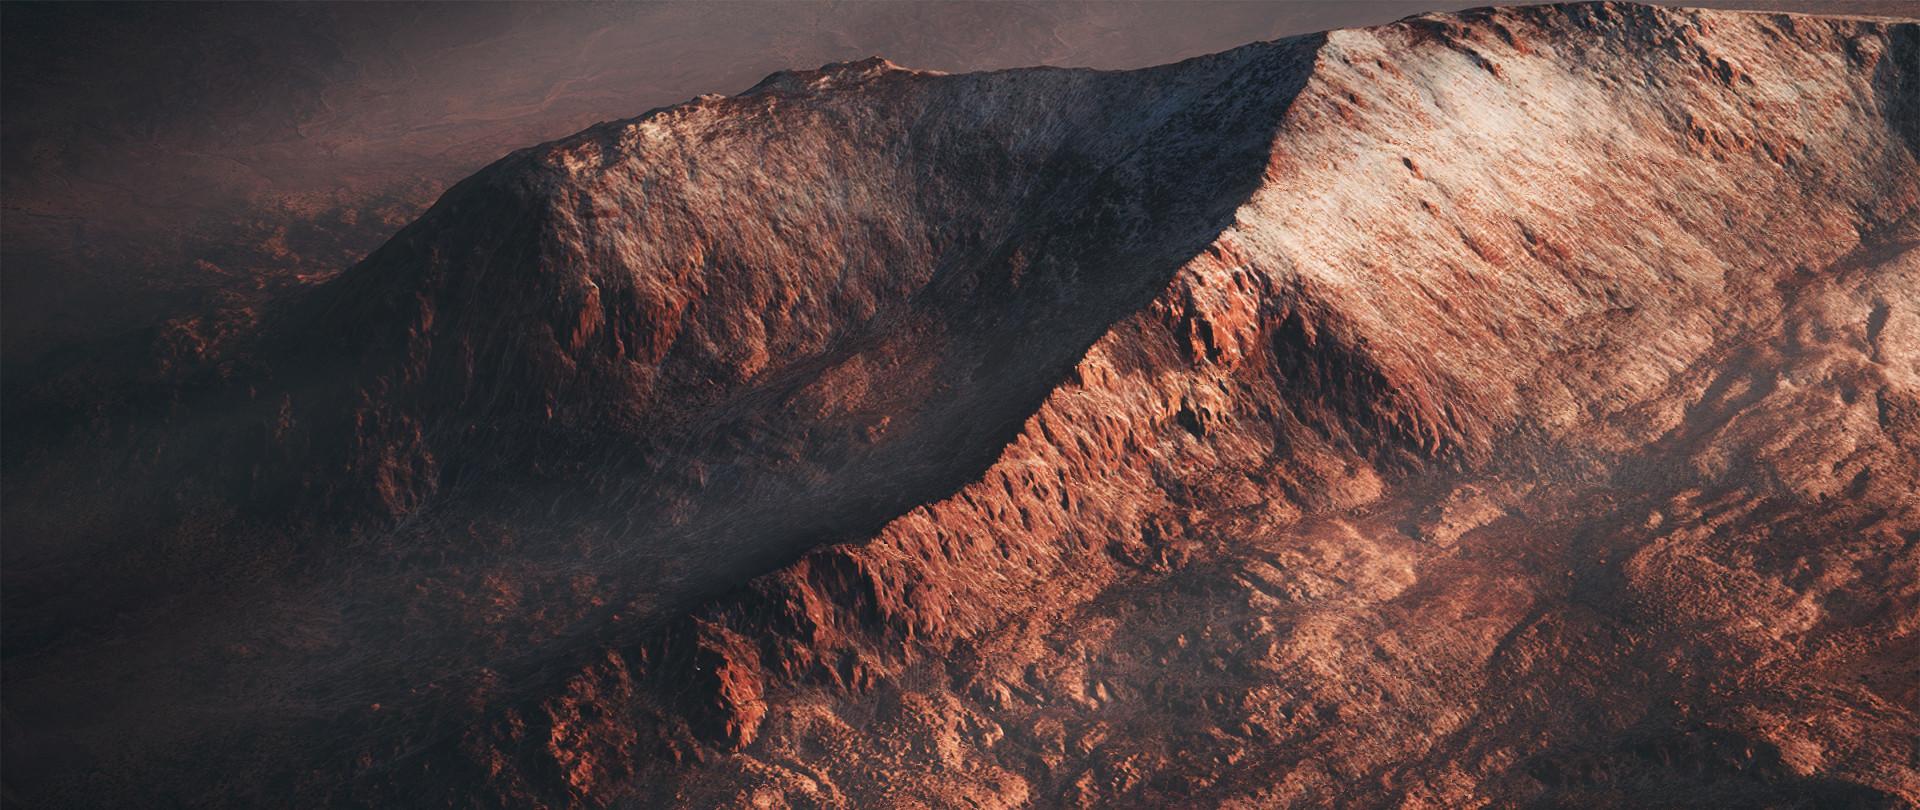 Joe garth joe garth skybrush desertmountains 1920x810